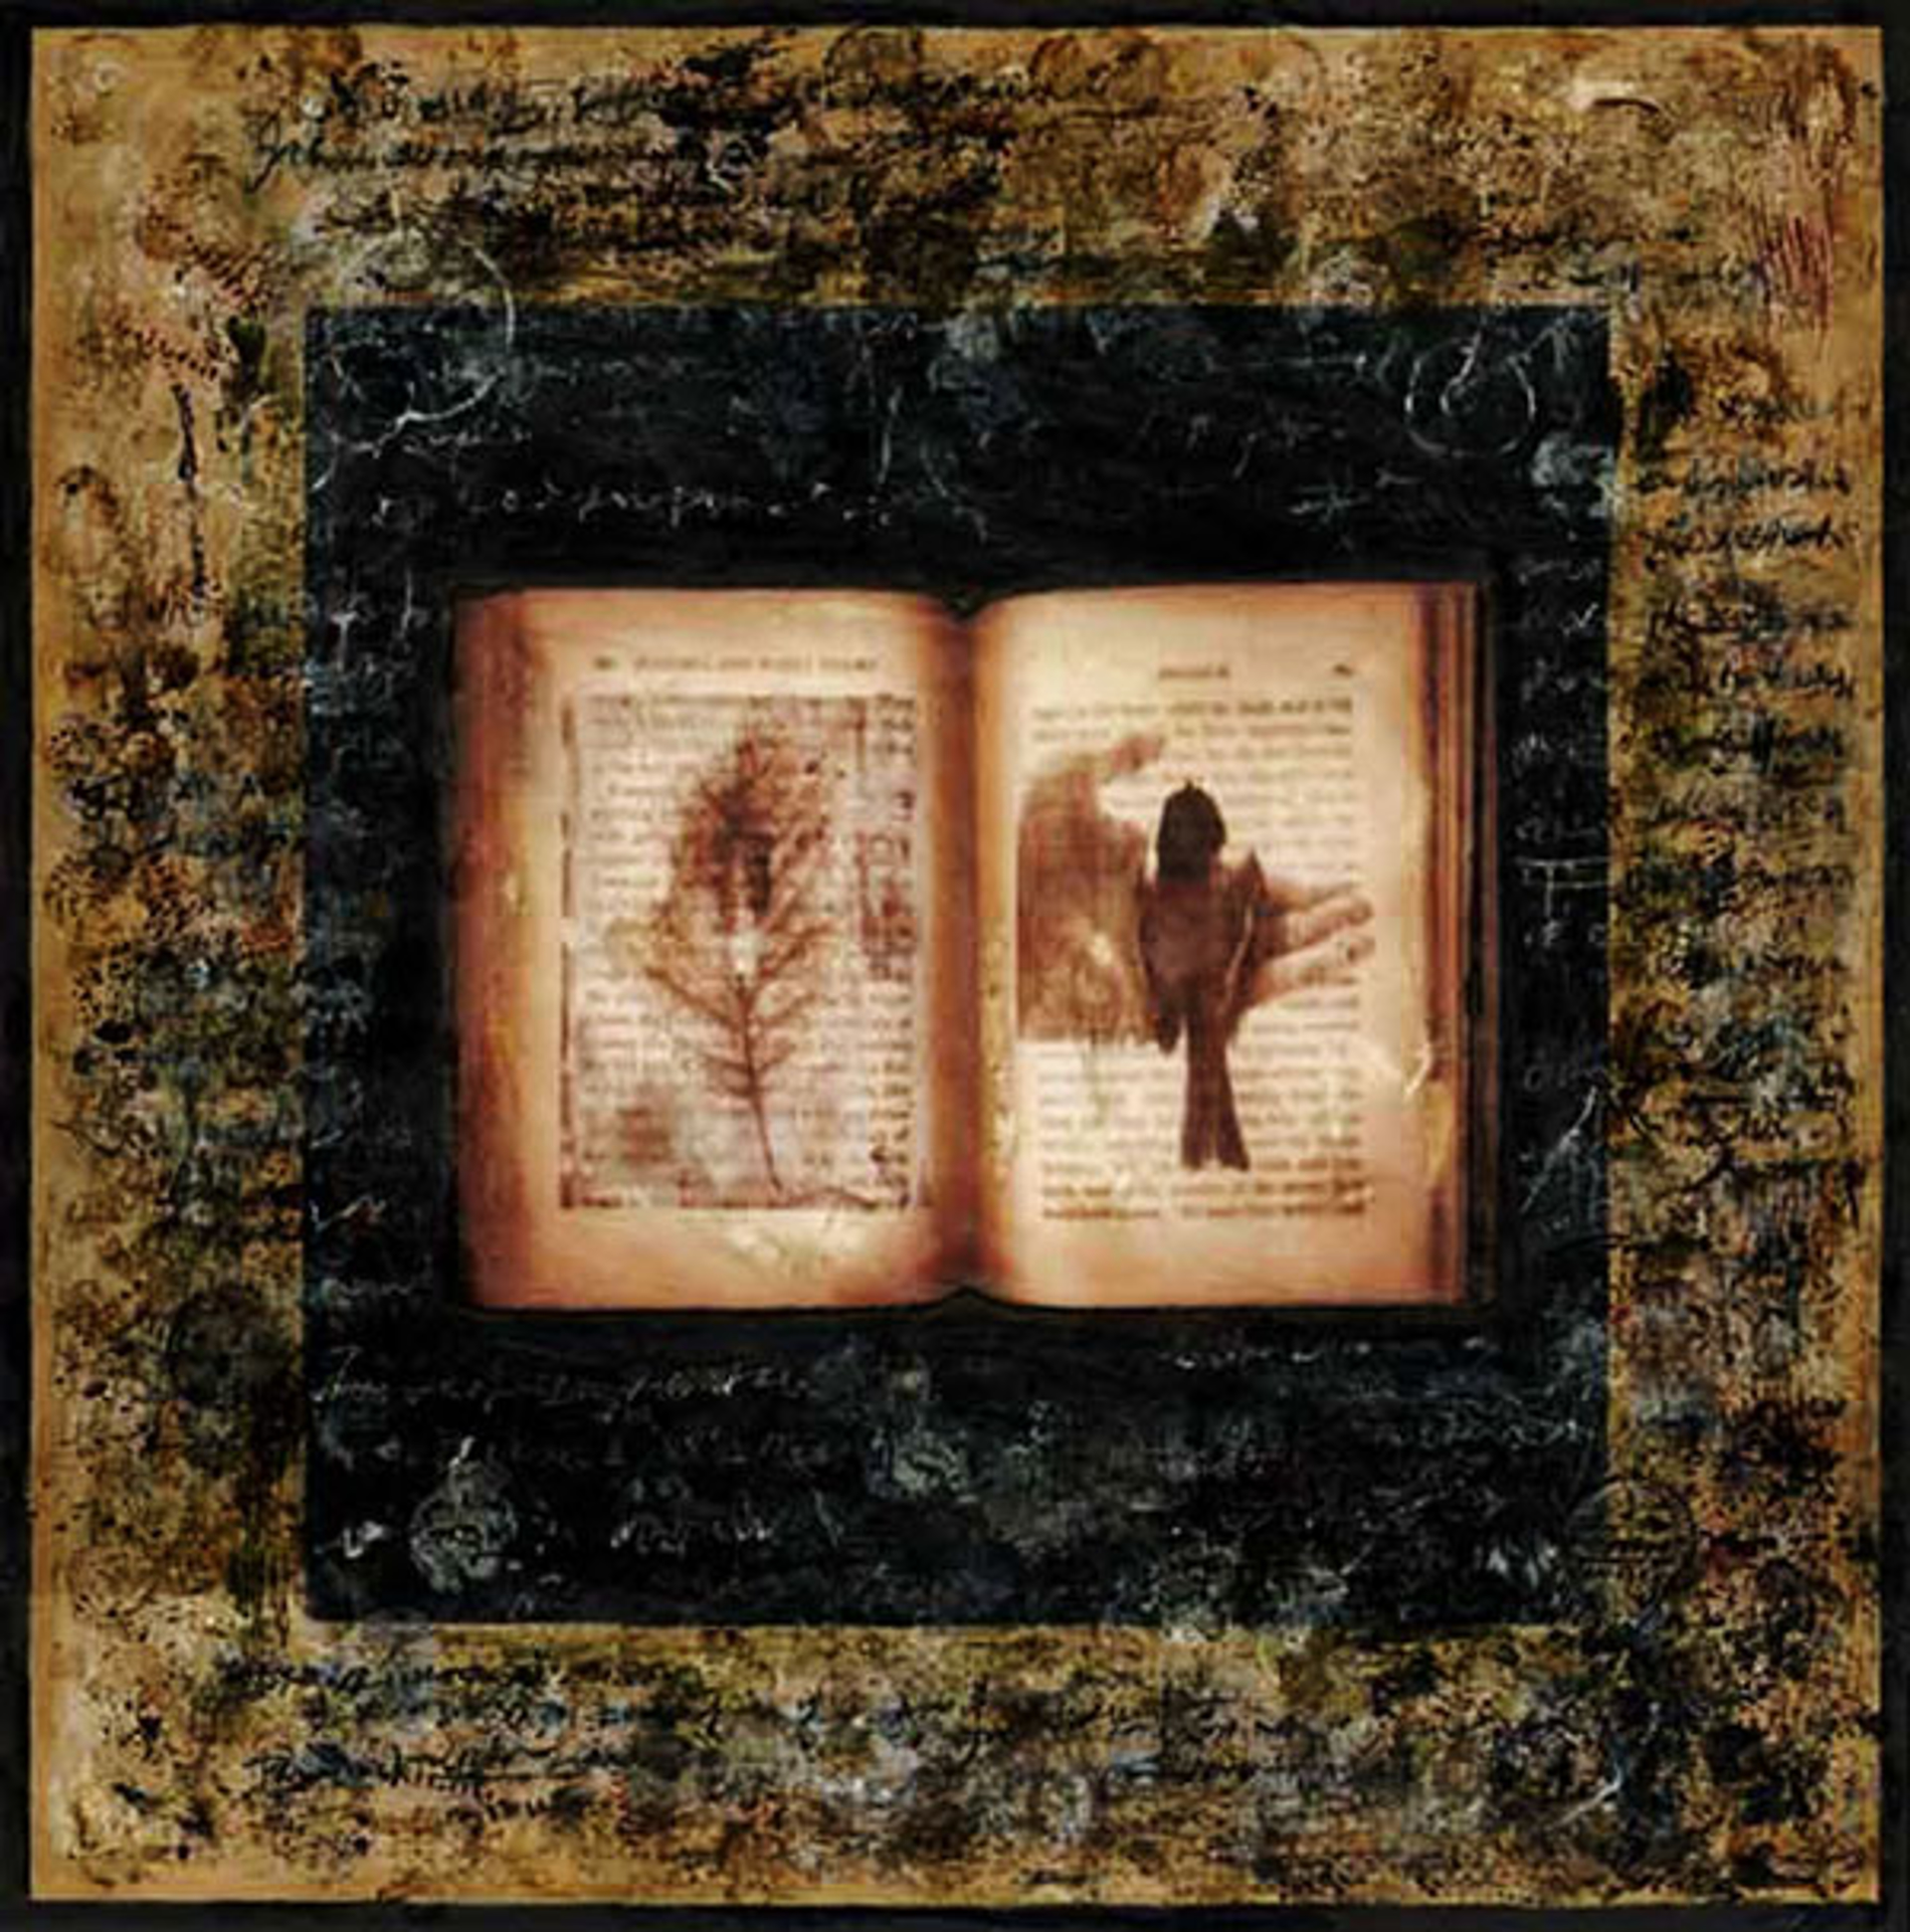 Journal - Book of Dreams by Yuko Ishii